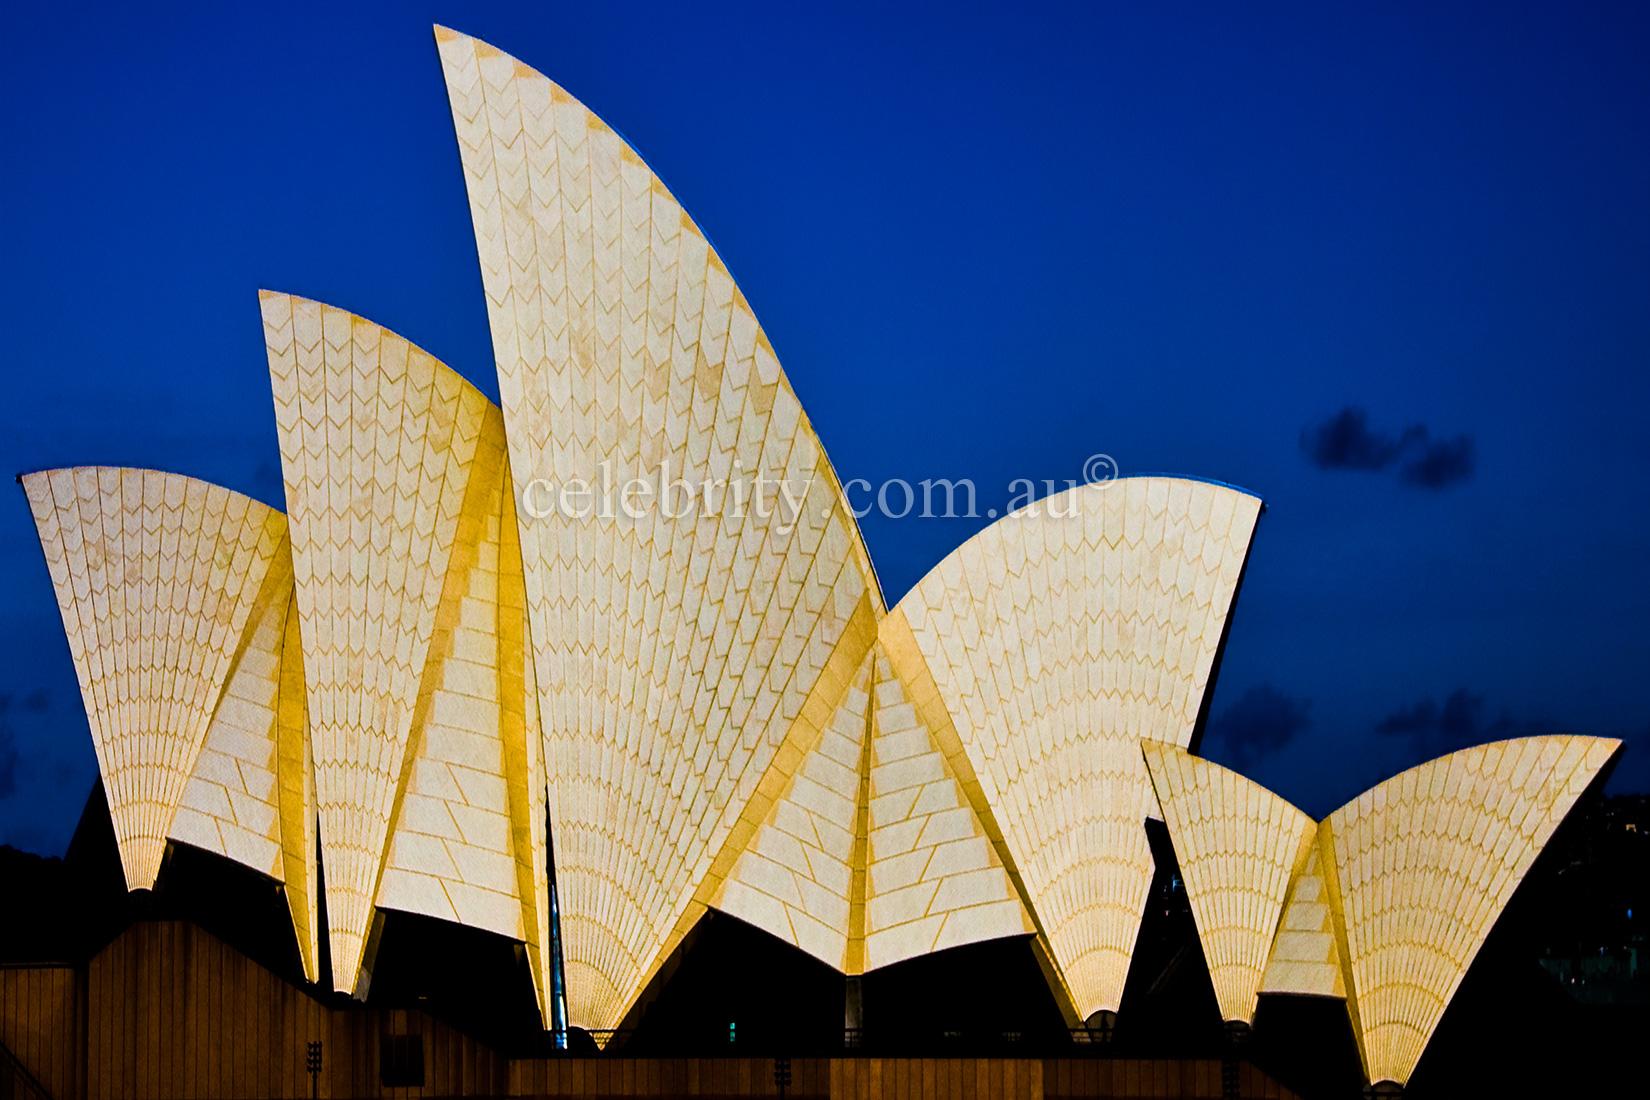 Sydney Opera House in Gold